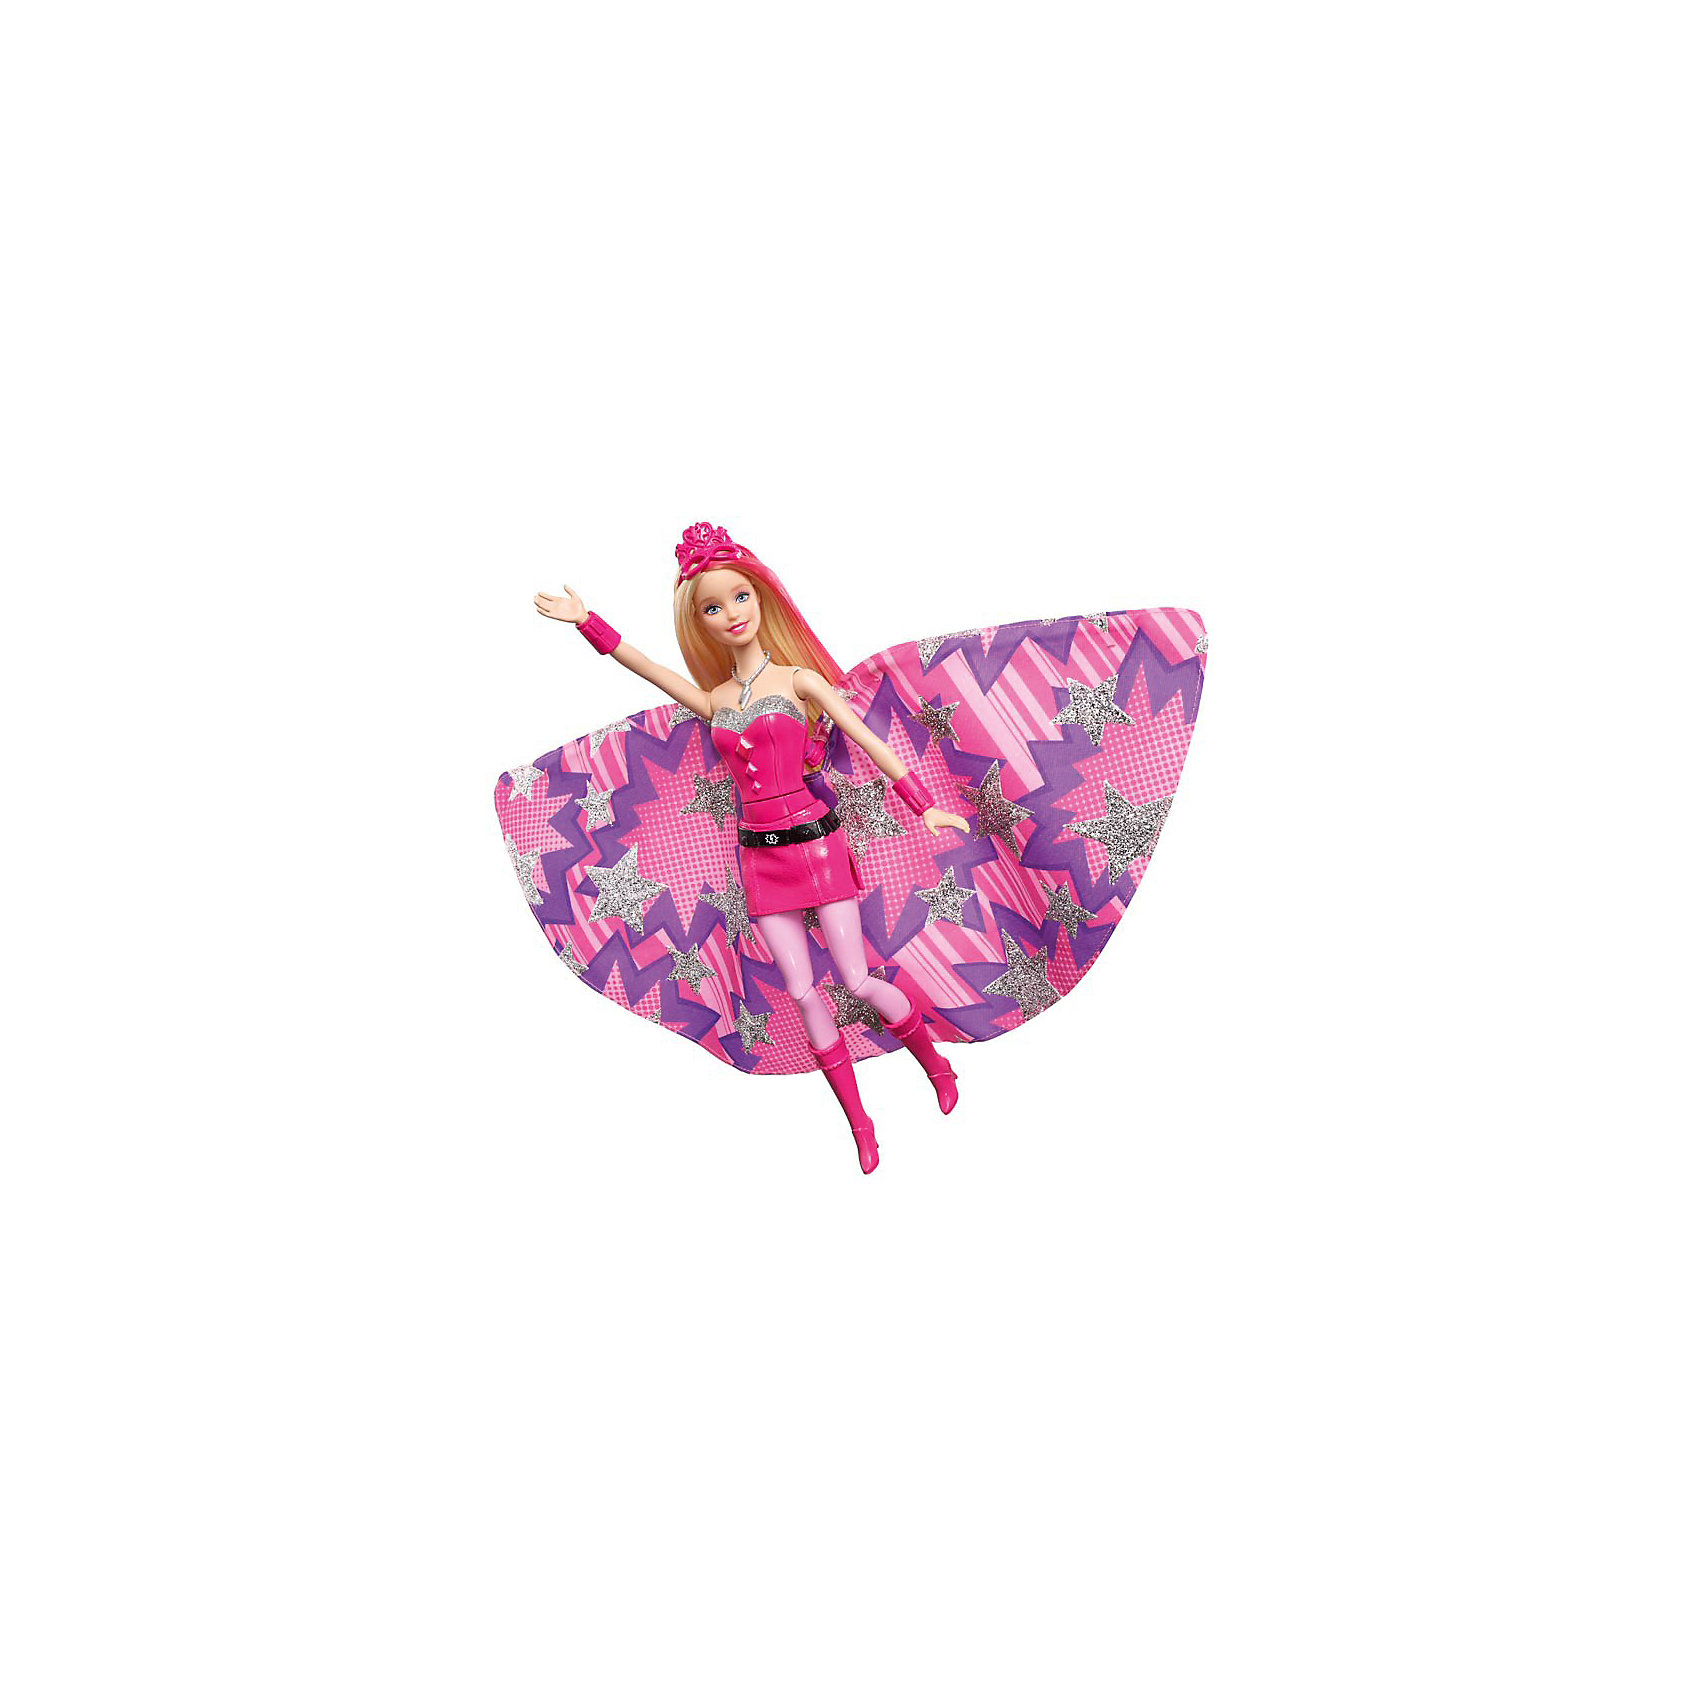 Супер-принцесса Кара, Barbie